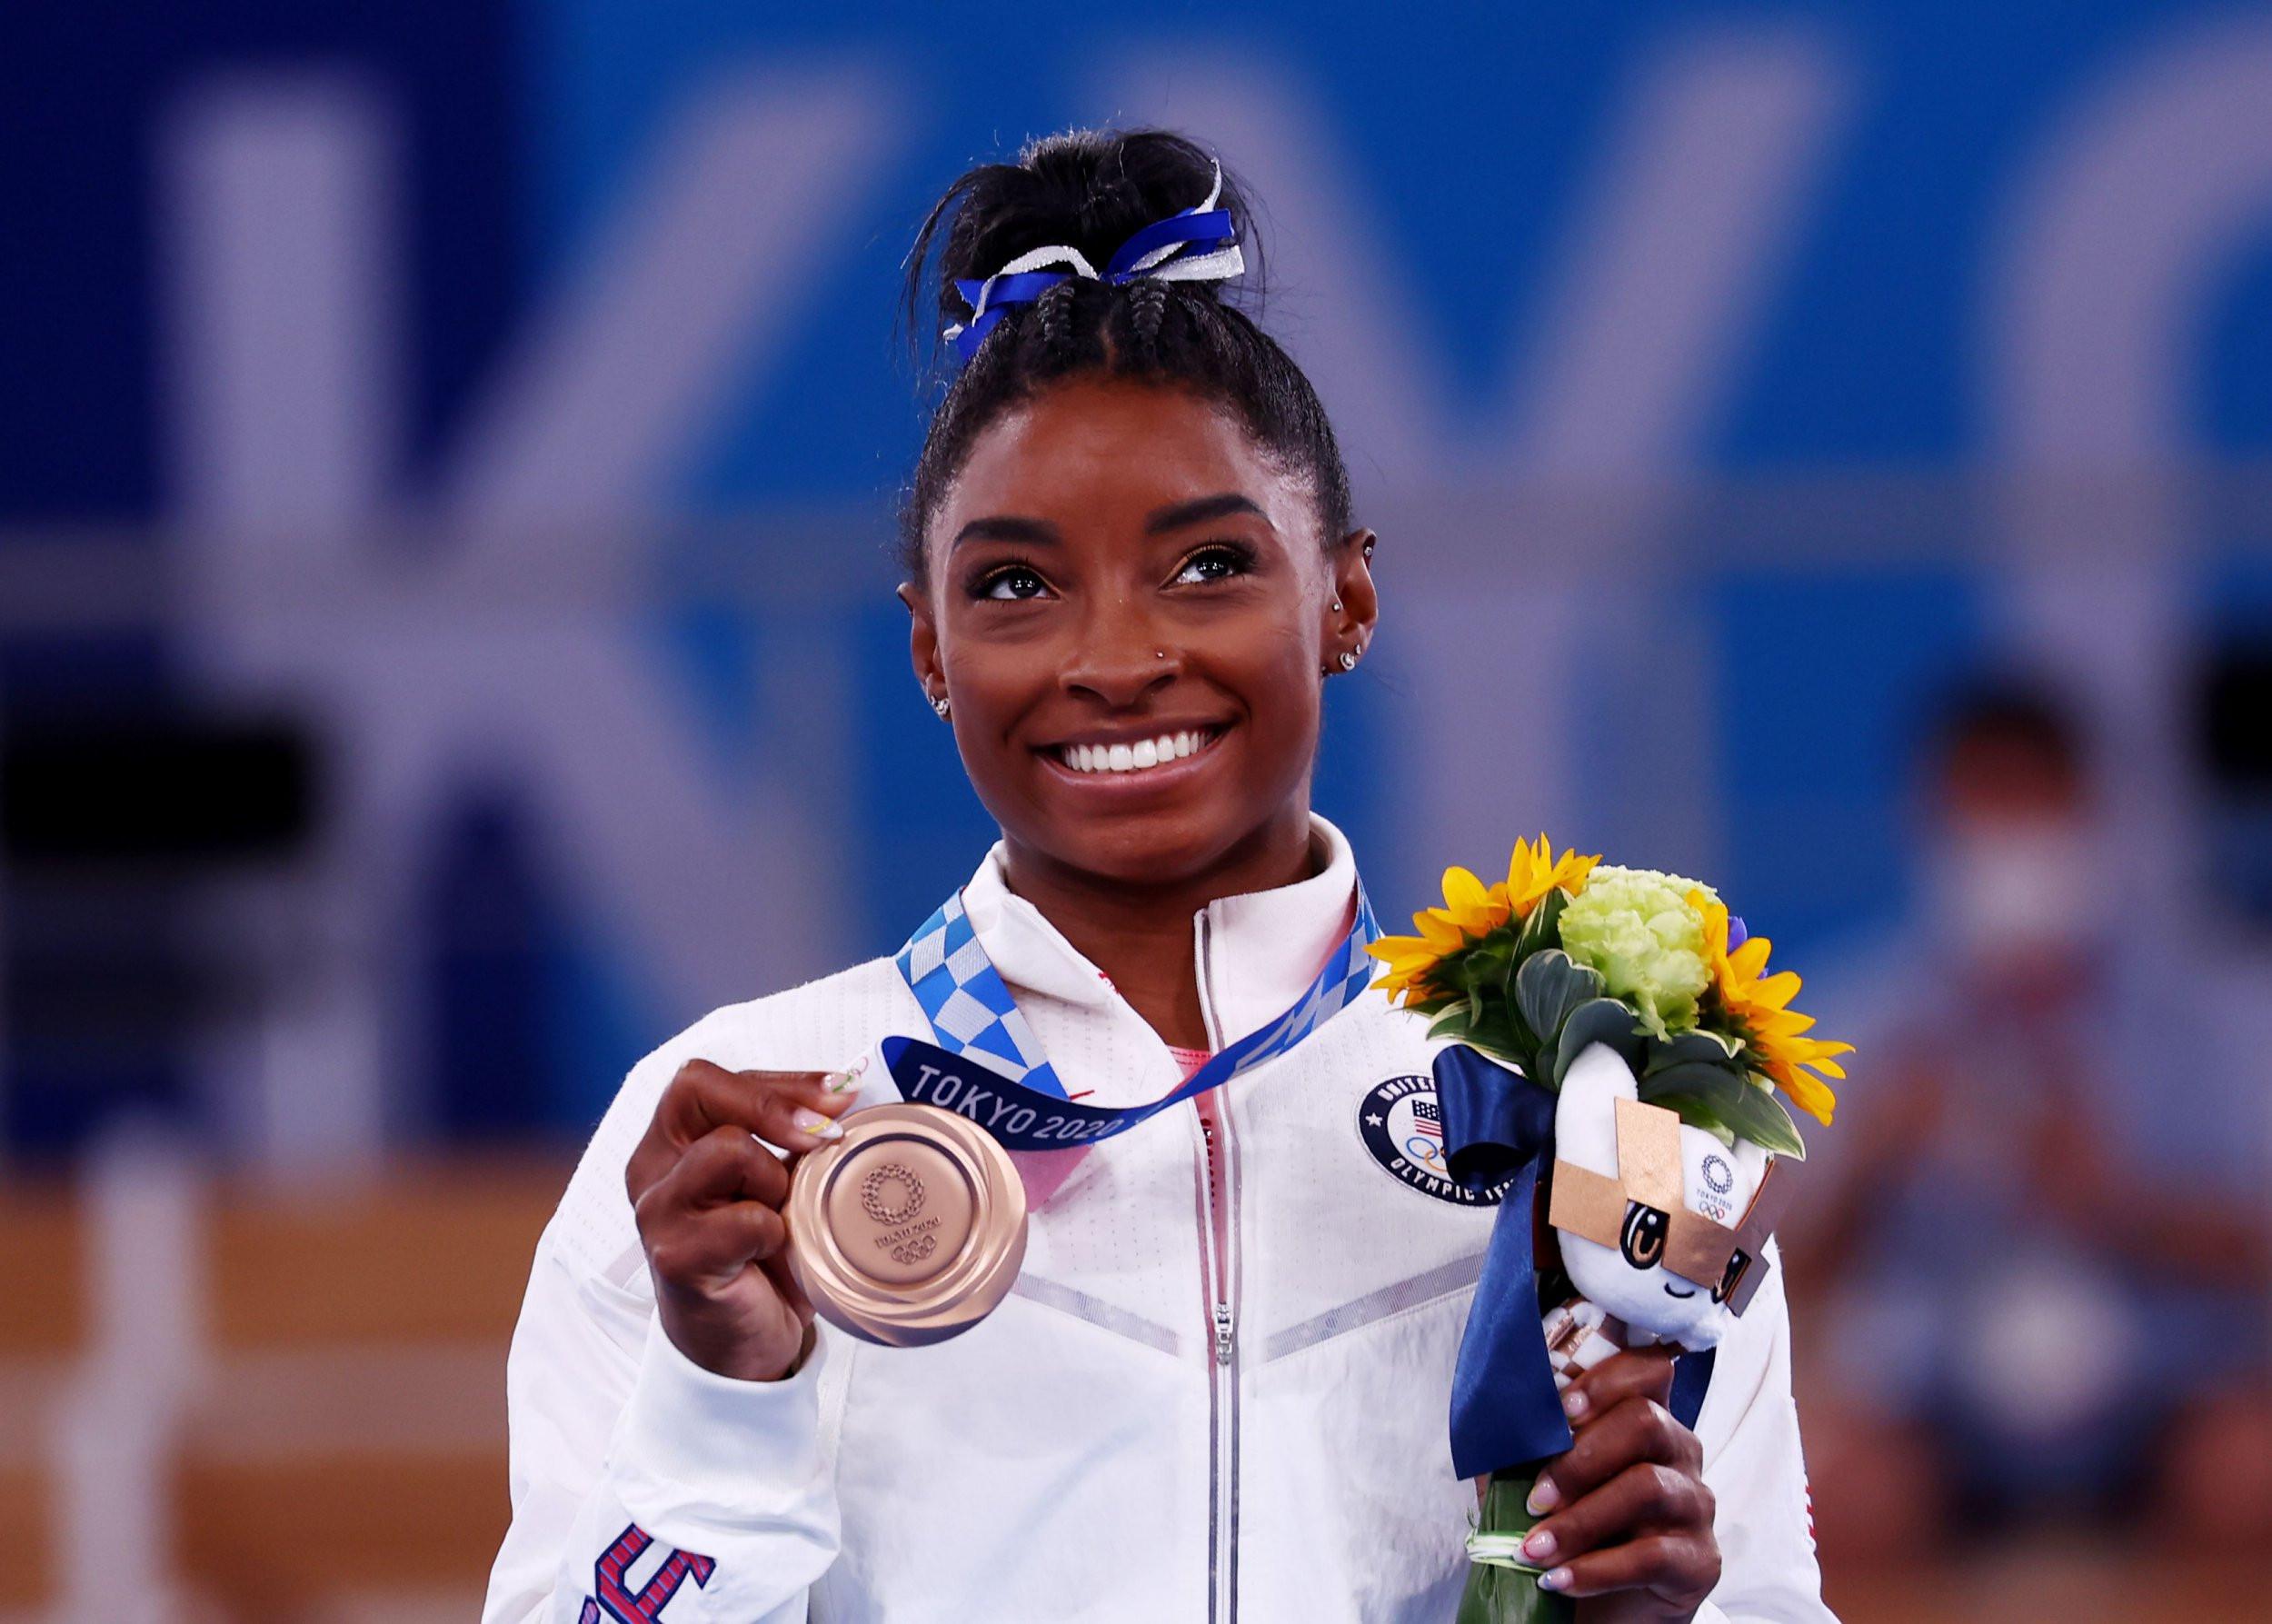 Simone Biles reacts to balance beam bronze medal: 'It's a little bit sweeter than 2016'